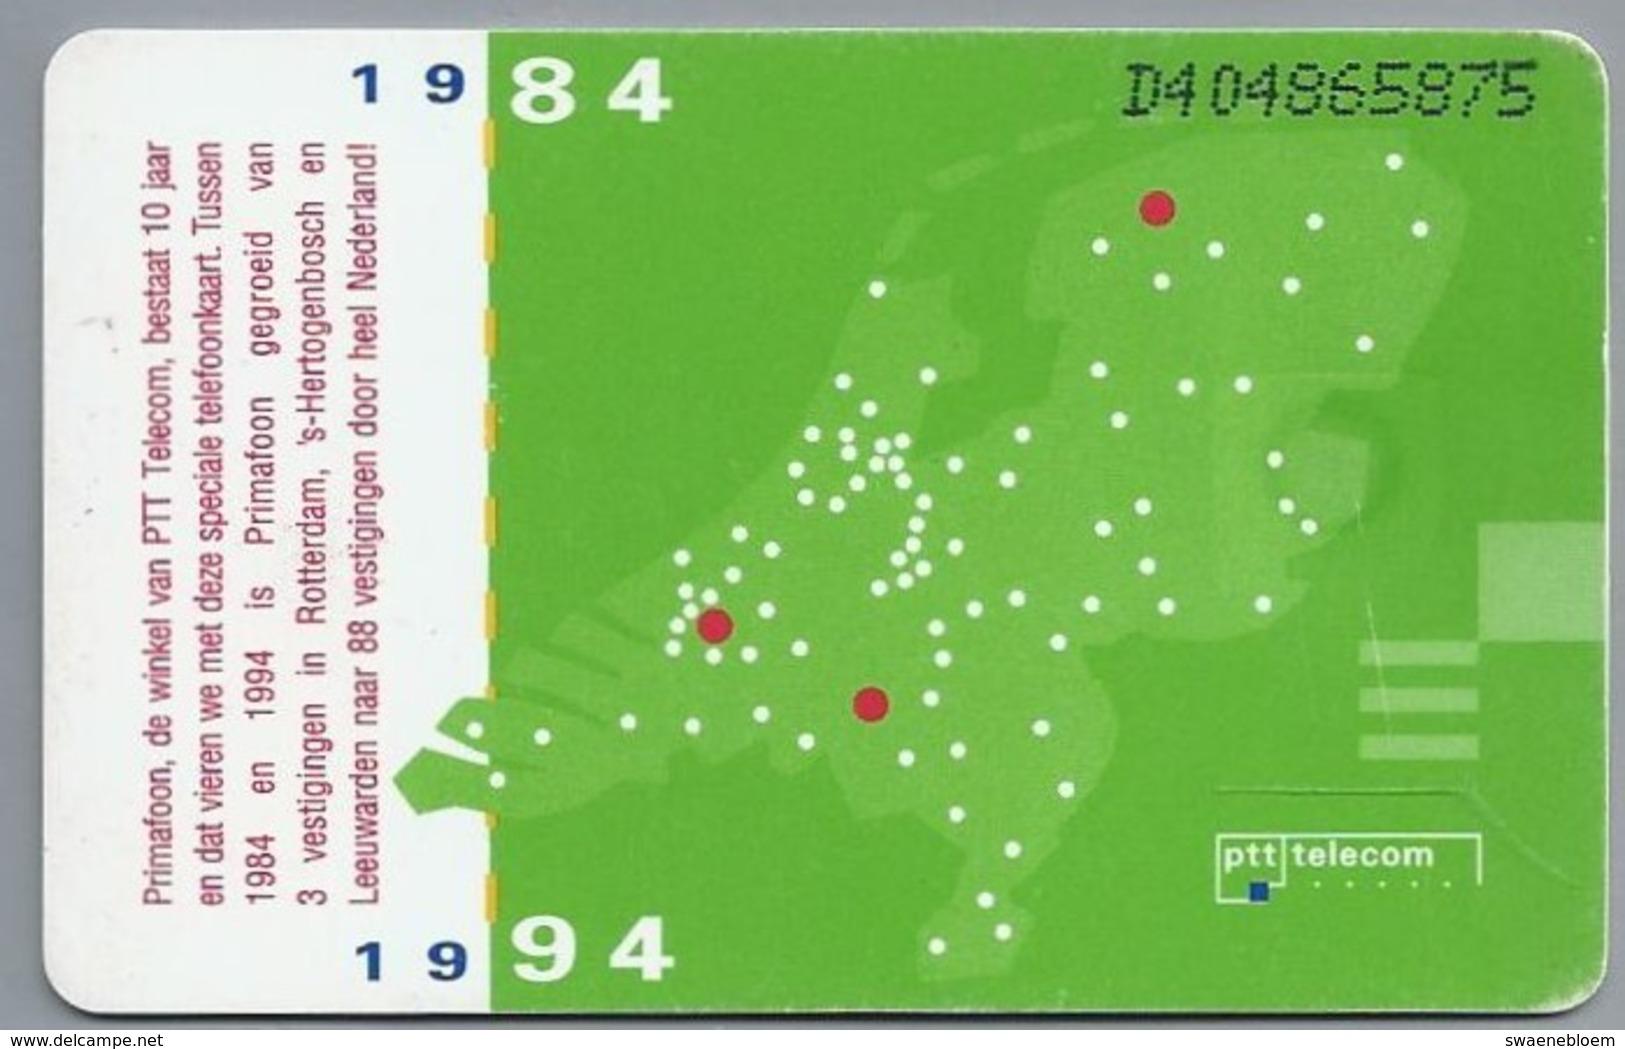 NL.- Telefoonkaart. PTT TELECOM. 5 Gulden. Primafoon 10 Jaar. 1984 - 1994. D404 - Telecom